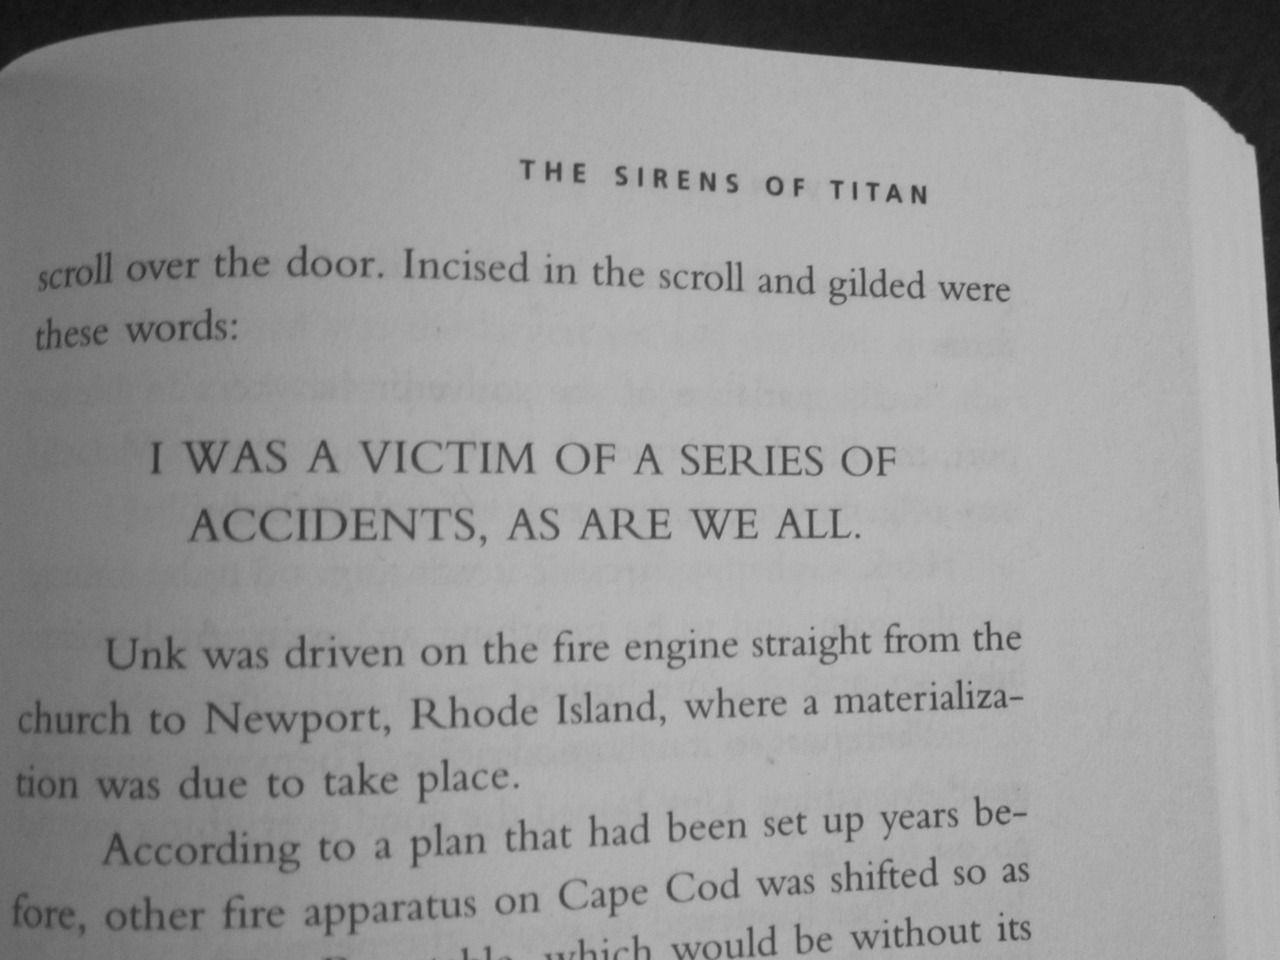 The Sirens Of Titan By Kurt Vonnegut I Was A Victim Of A Series